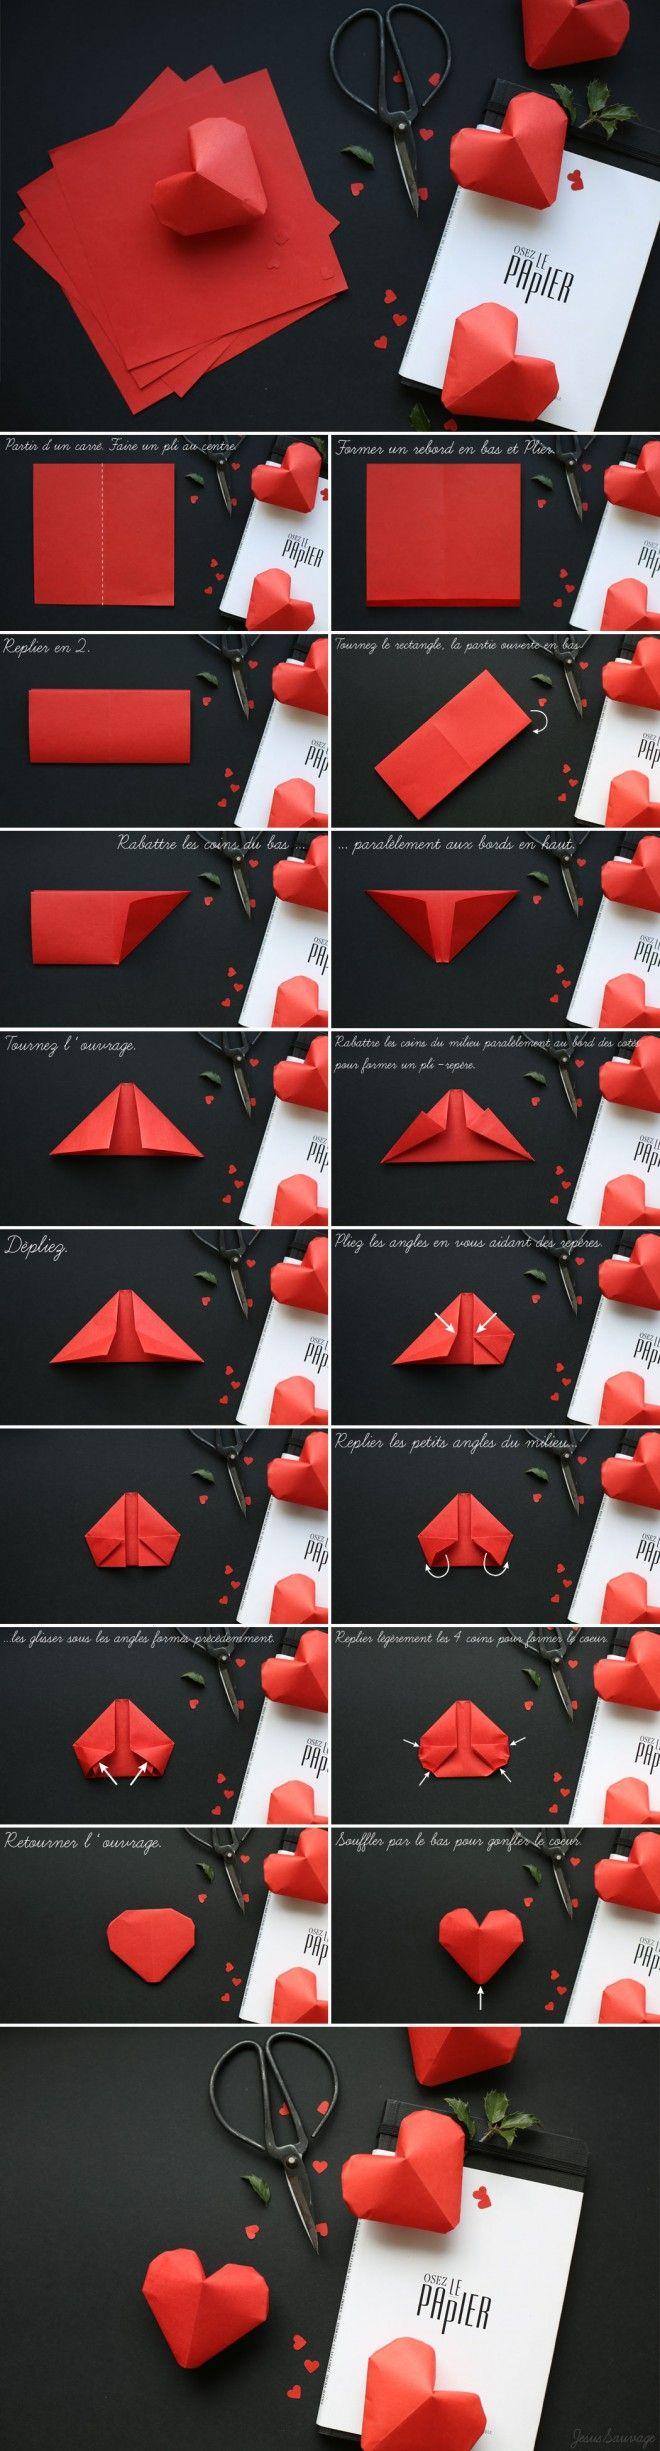 best 25 origami hearts ideas on pinterest origami heart